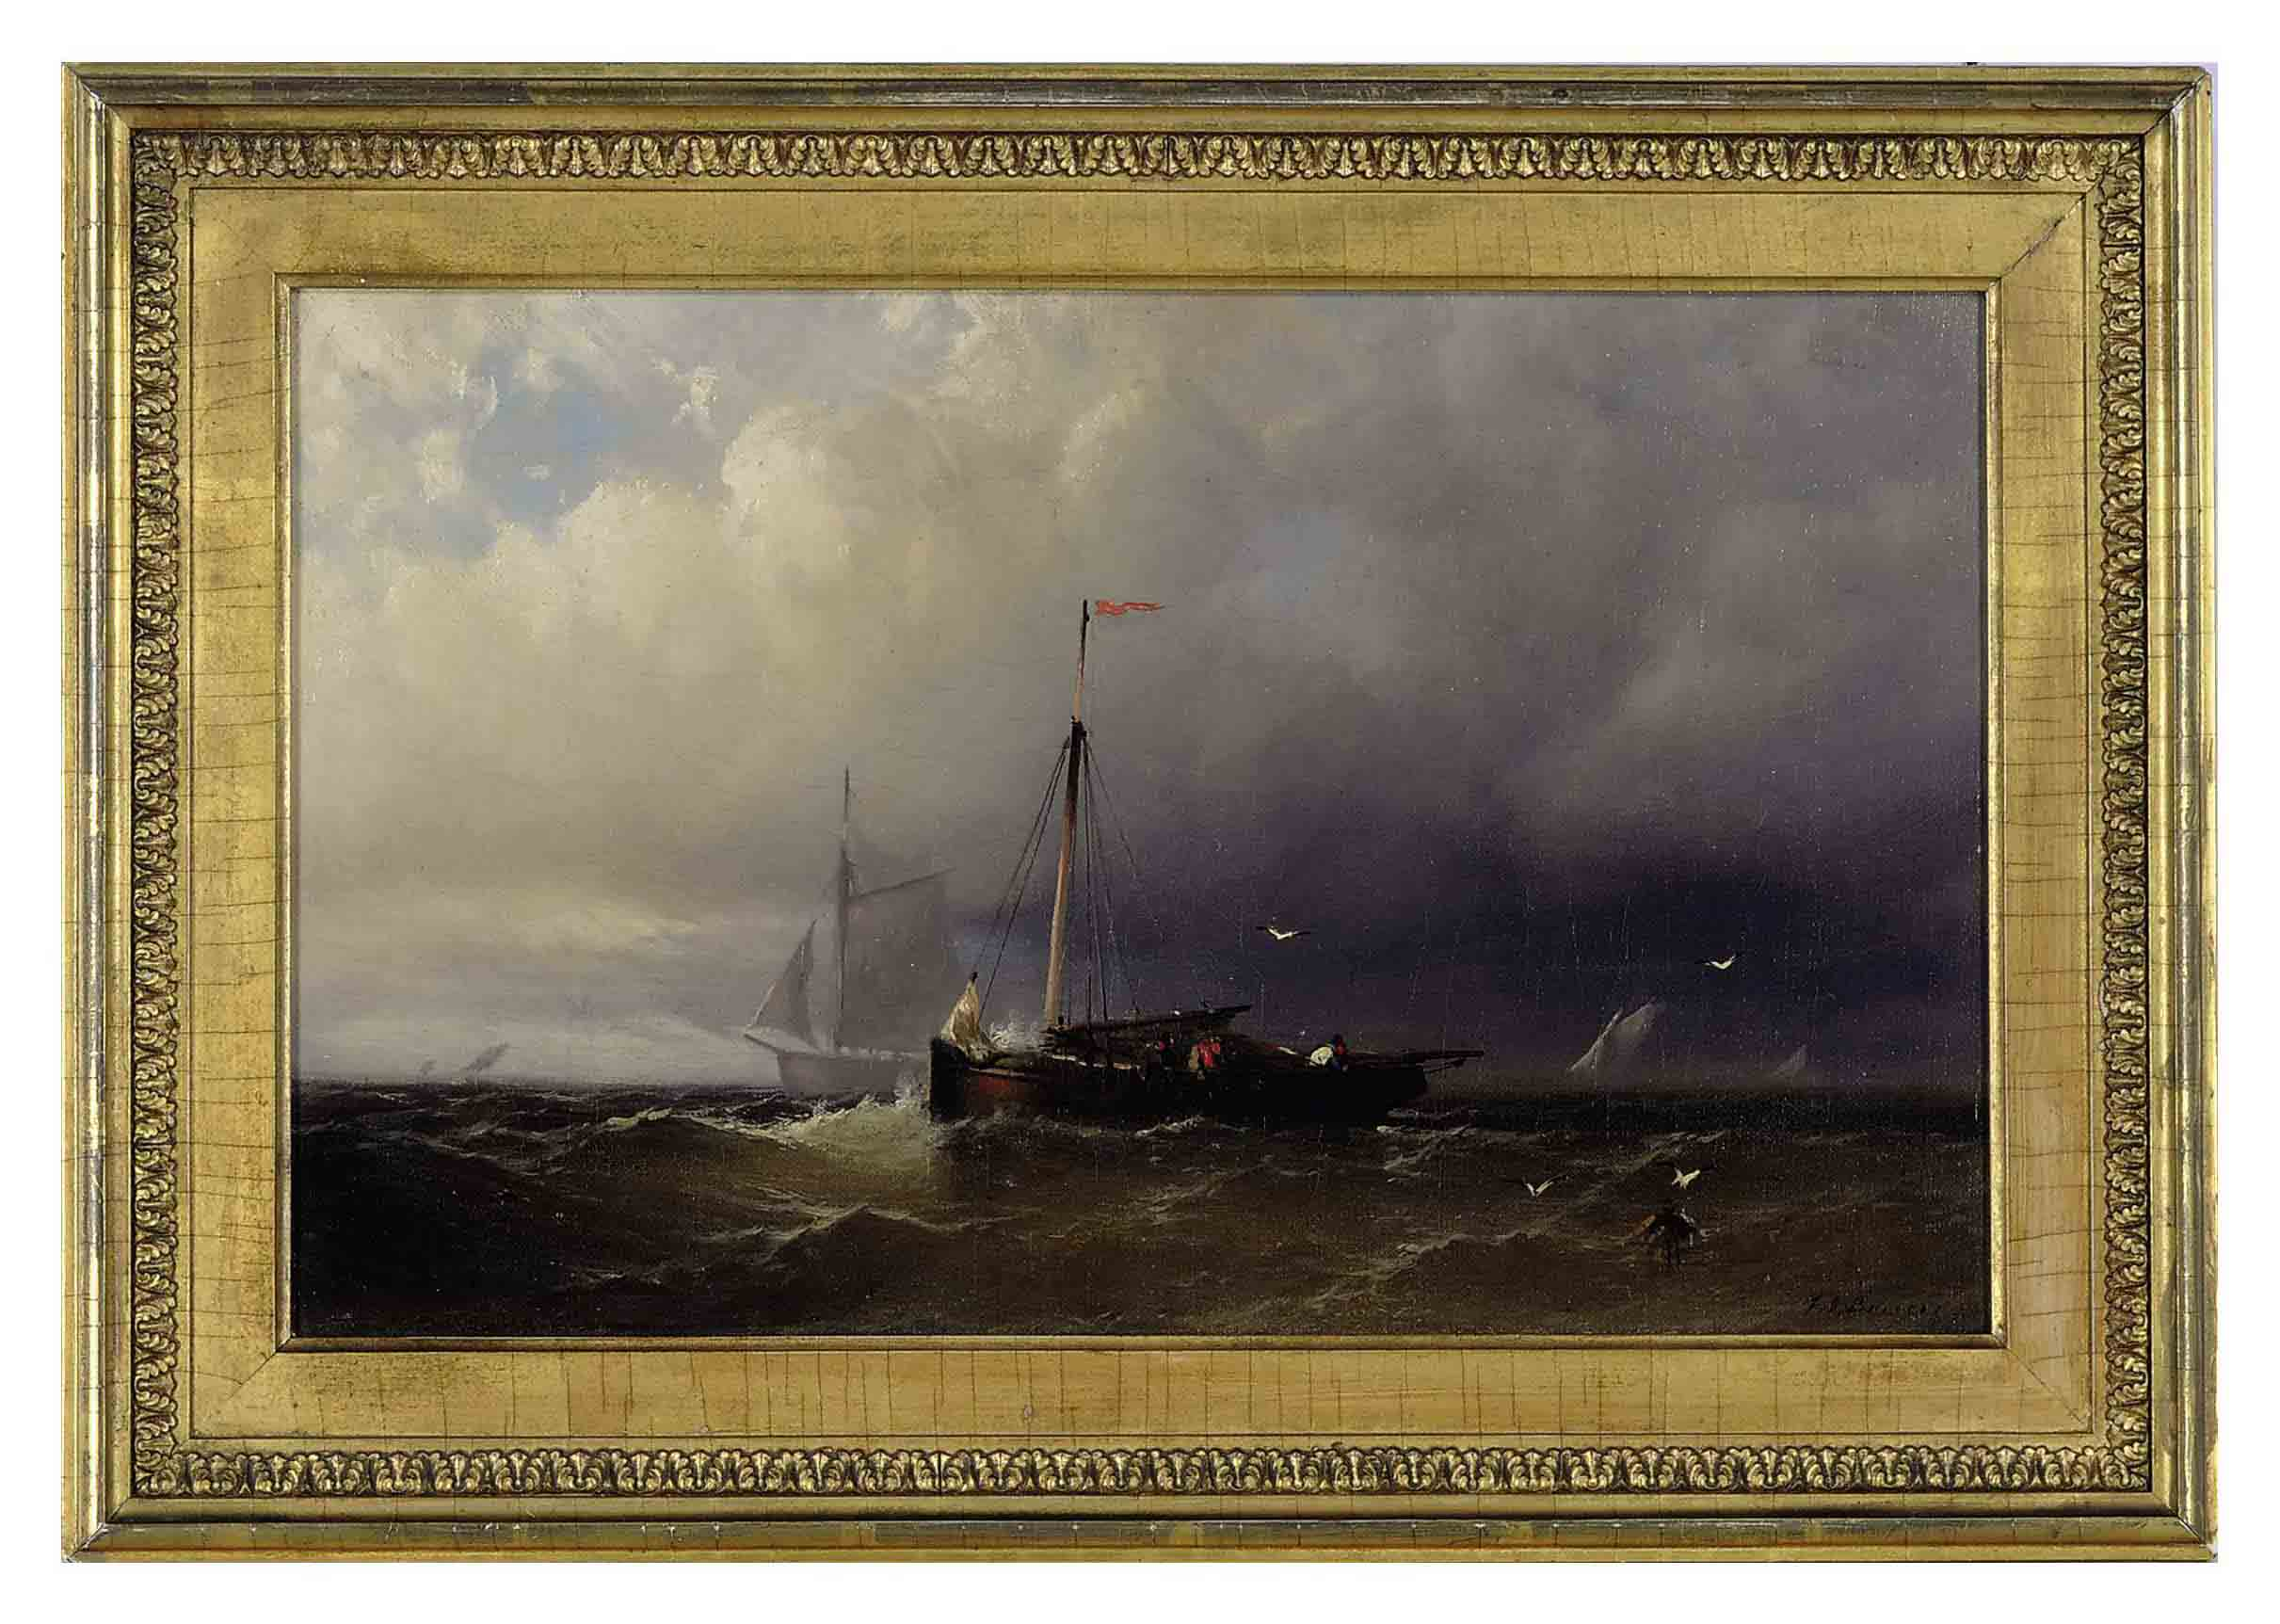 A fishing vessel at sea